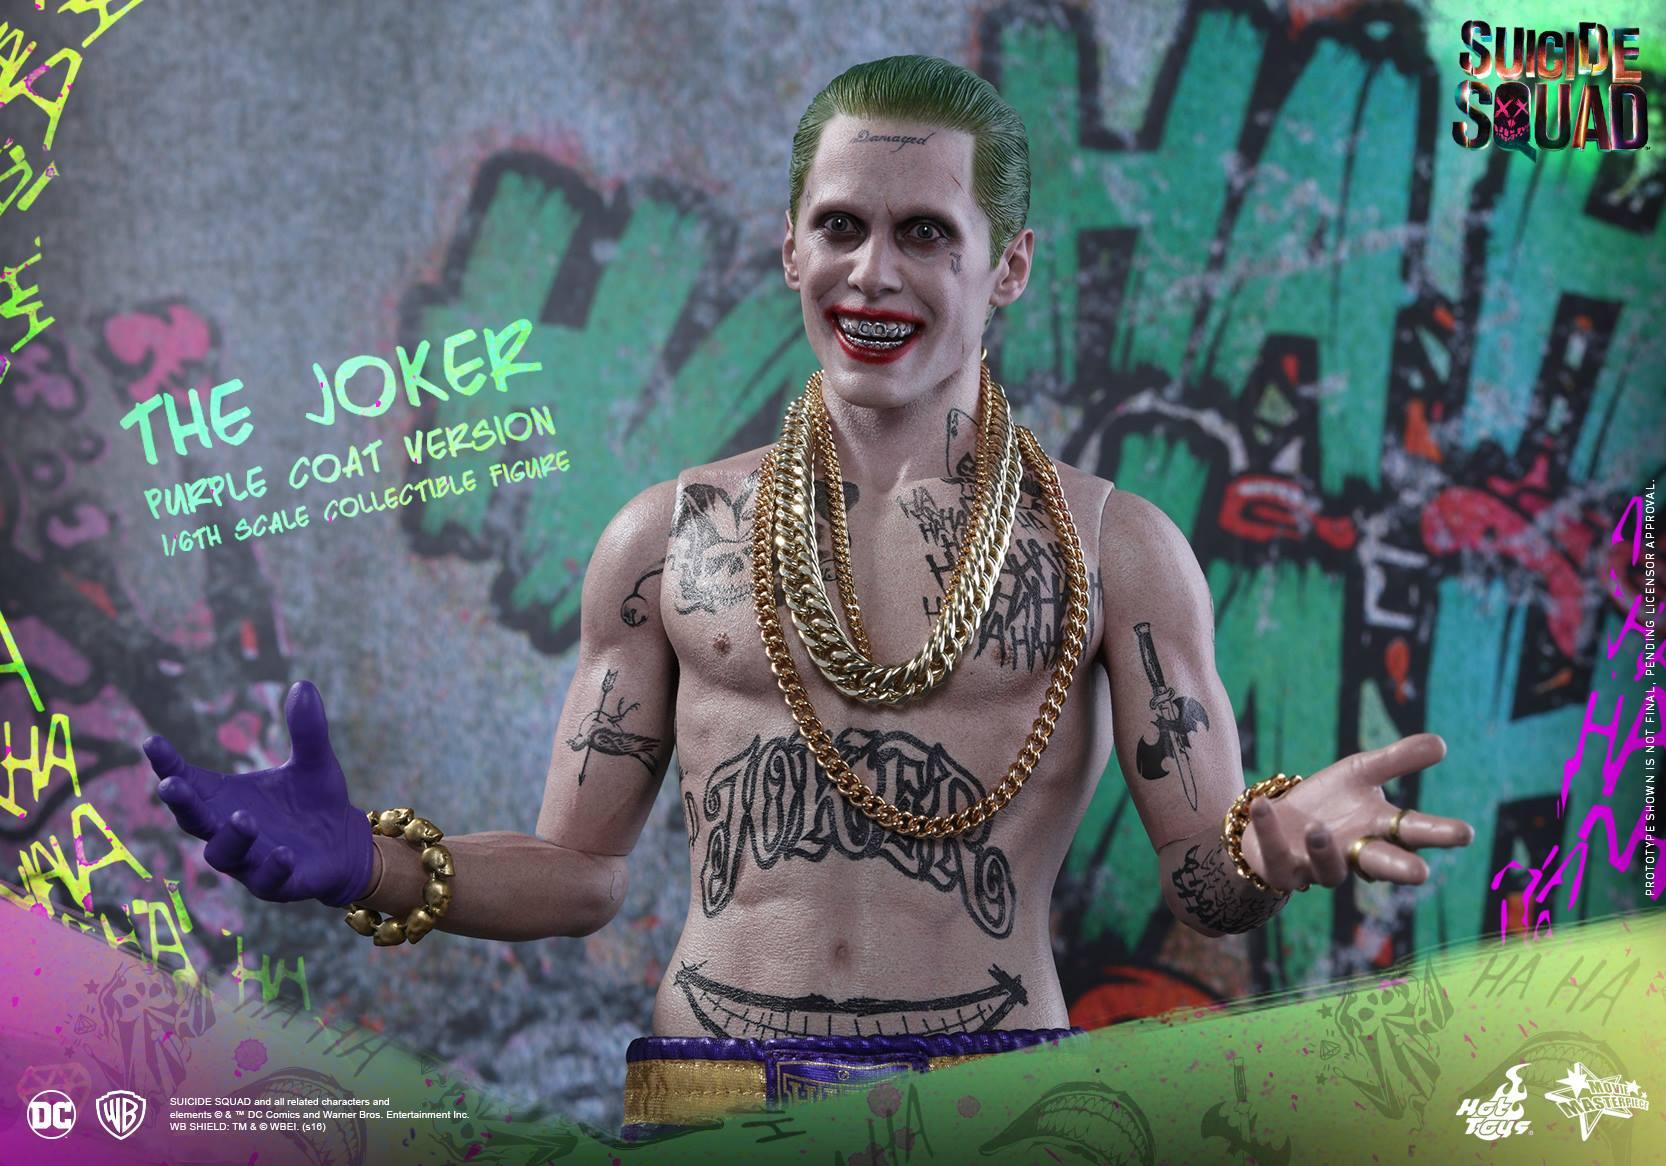 Hot-Toys-Suicide-Squad-Joker-Purple-Coat-6